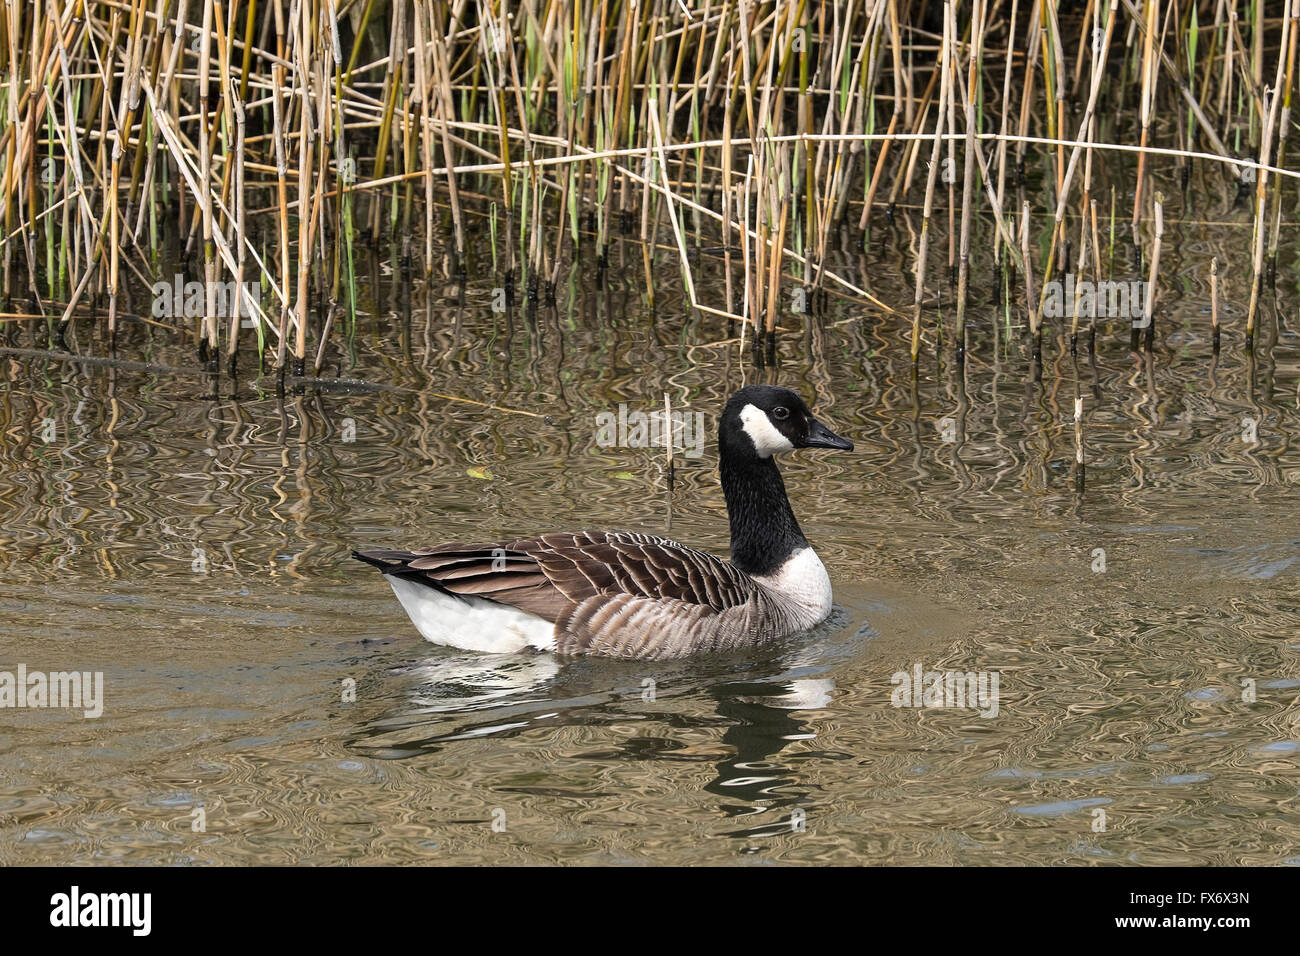 A Canada Goose. - Stock Image